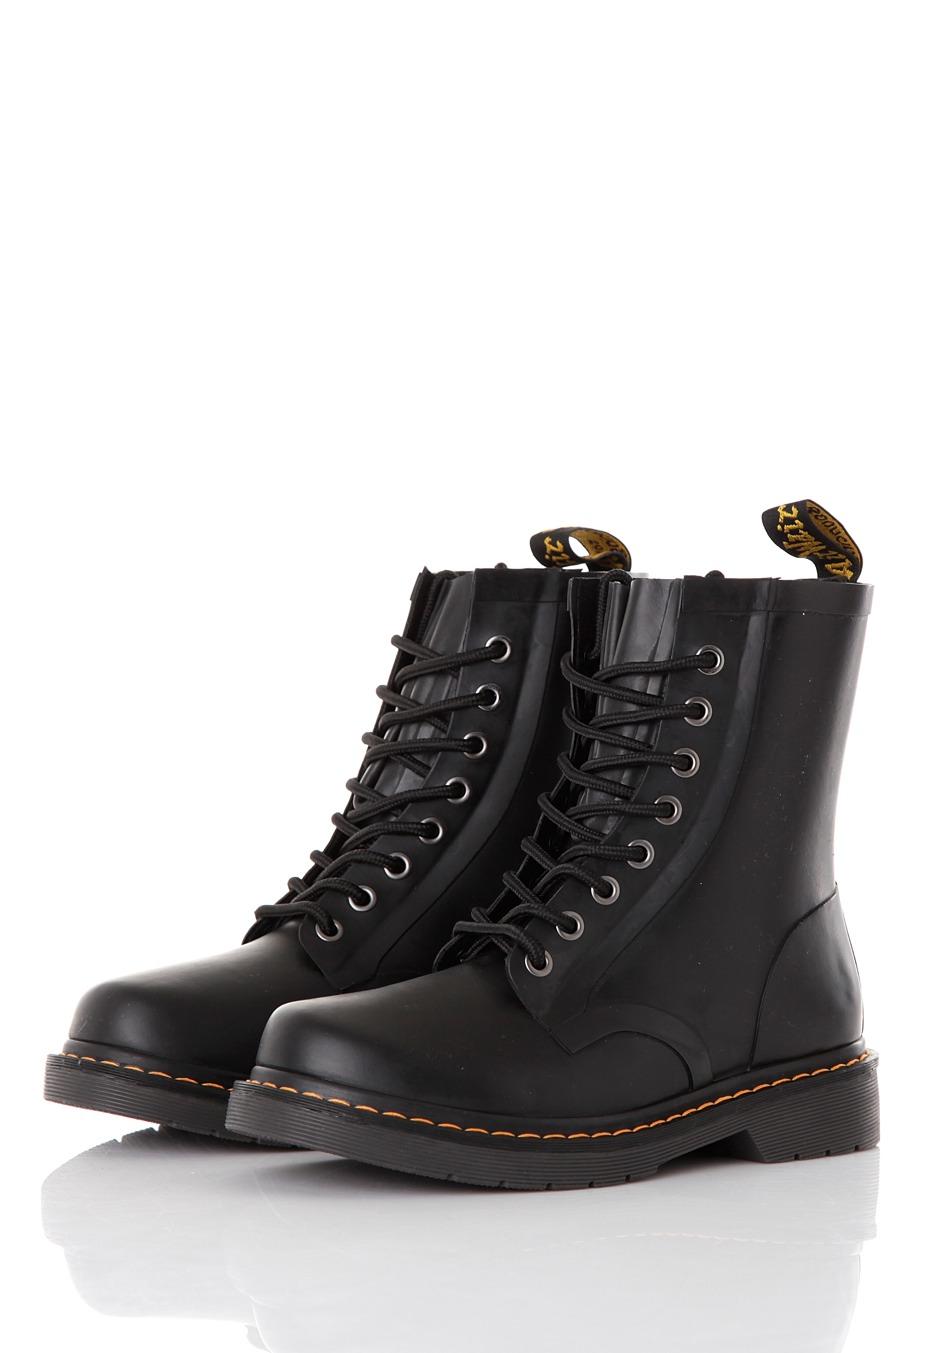 Dr Martens Dr Martens – Stiefel Dr Martens – Schuhe